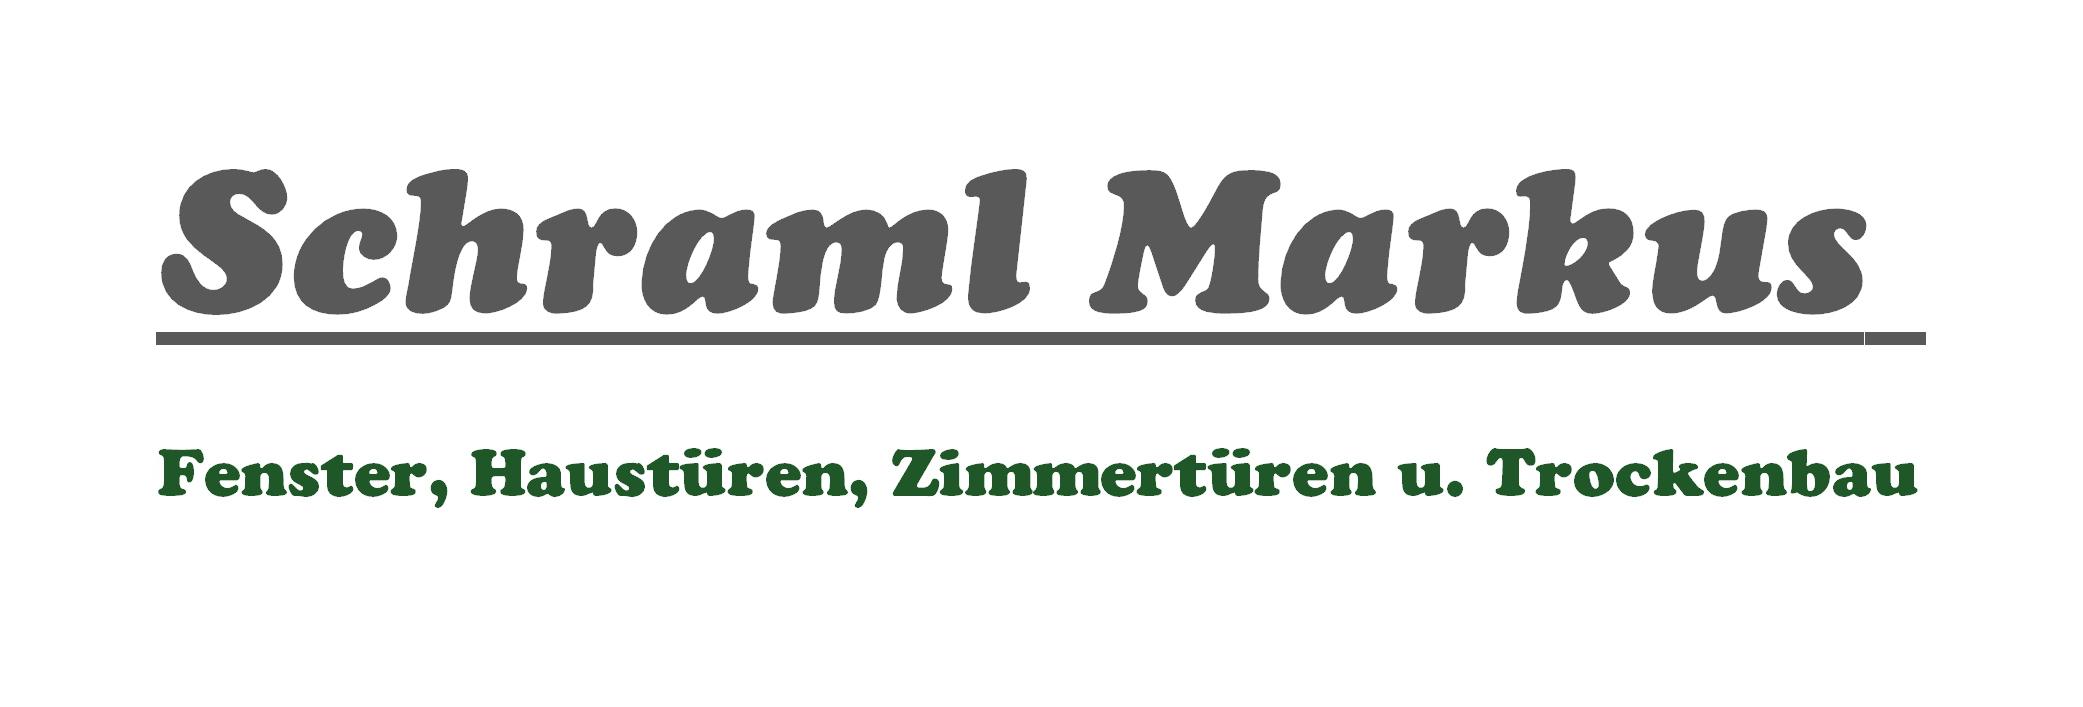 Trockenbau Schraml Markus